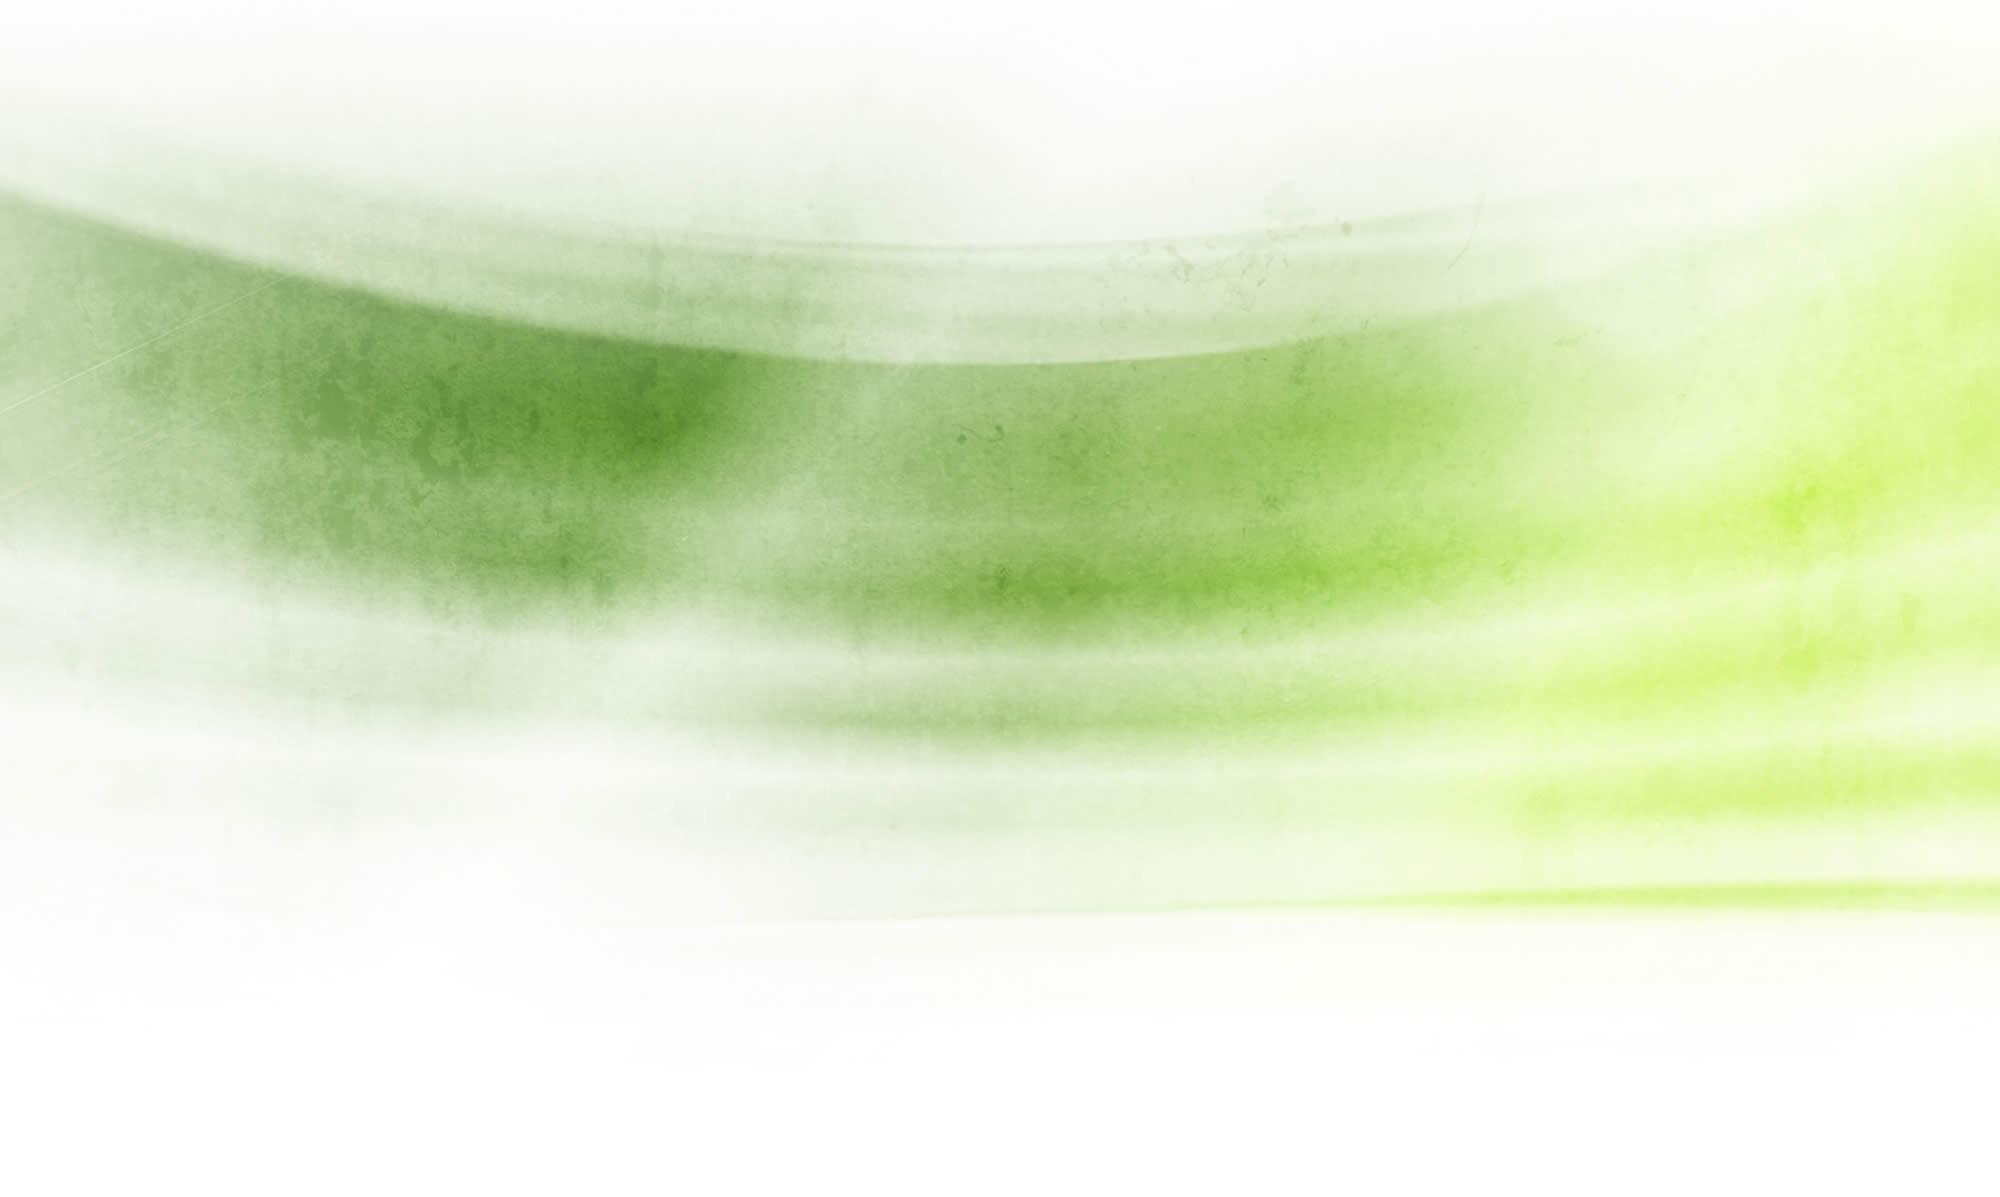 Green Grunge Background 183 '� Download Free Stunning High